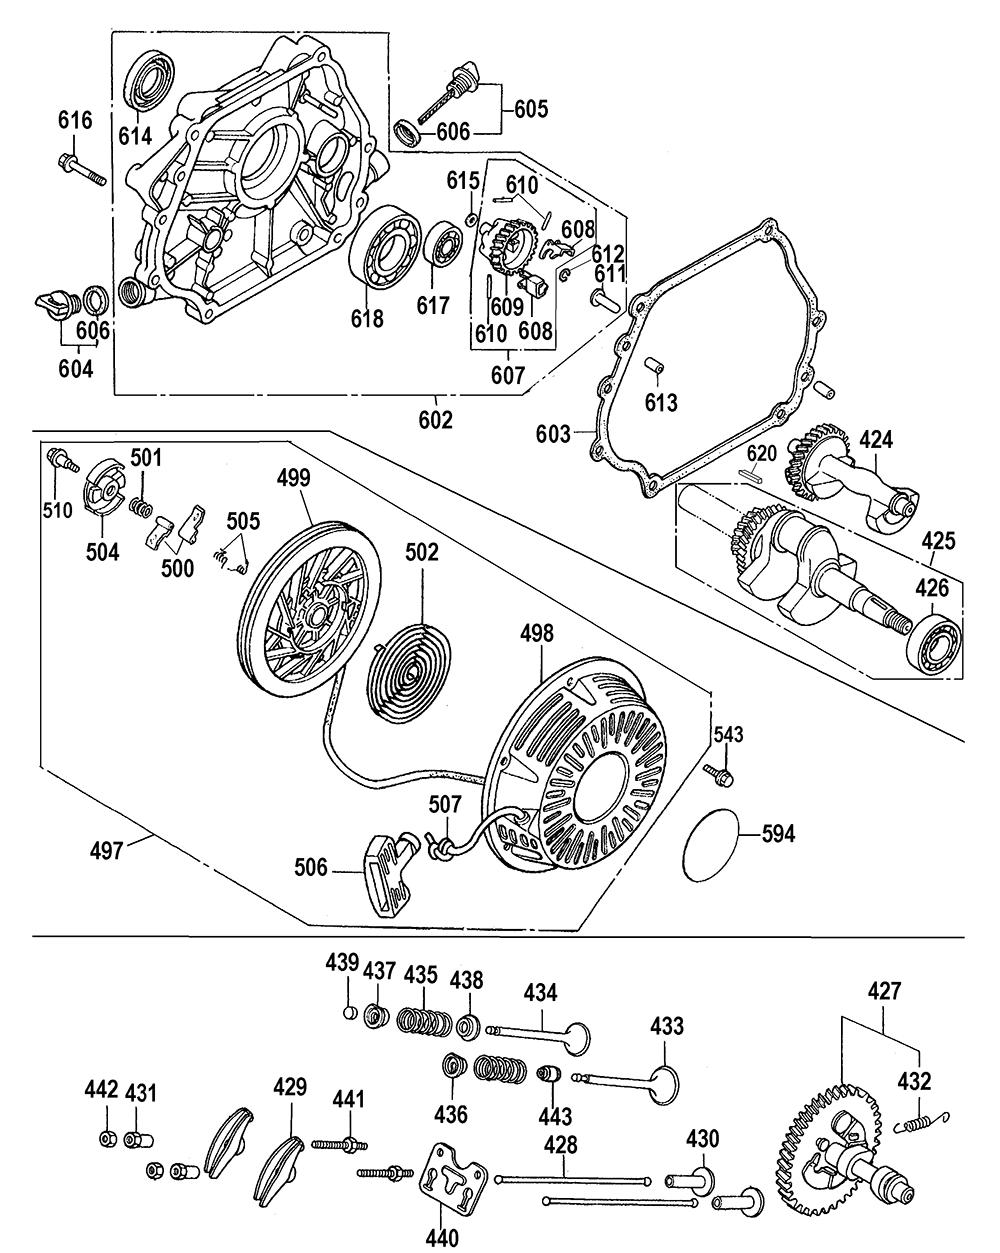 DP3750IC-Dewalt-T1-PB-3Break Down